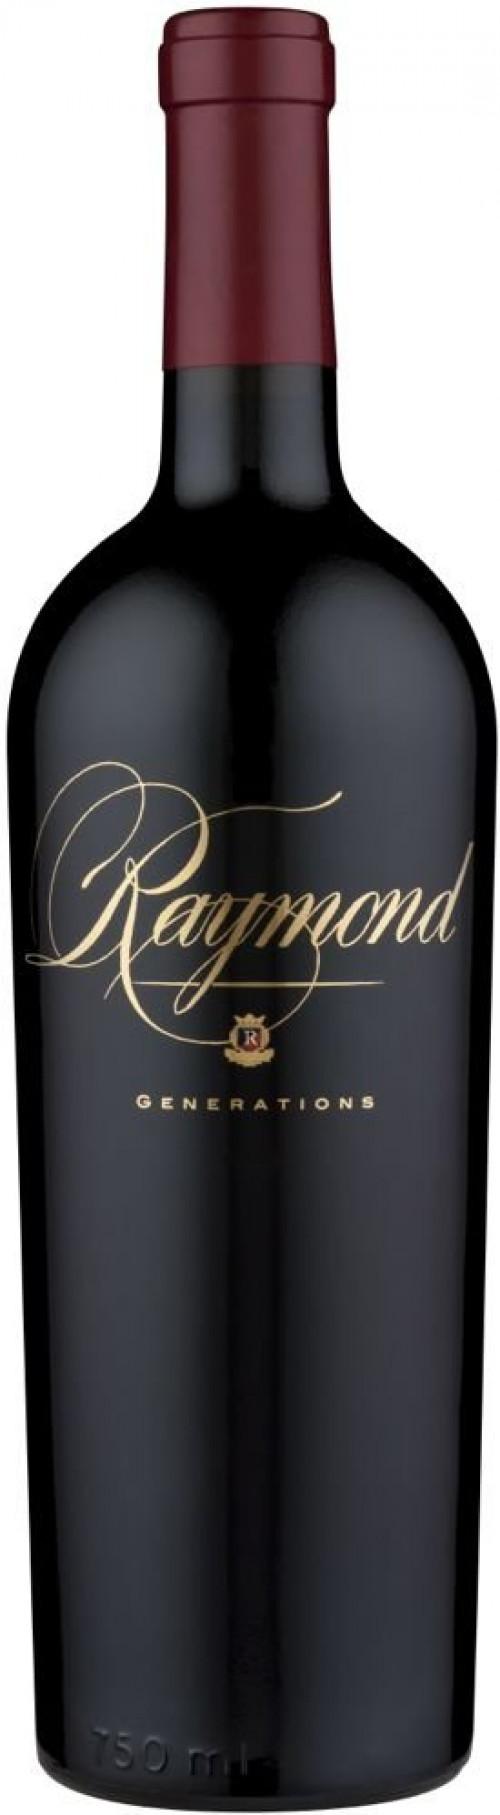 2015 Raymond Generations Red 750ml